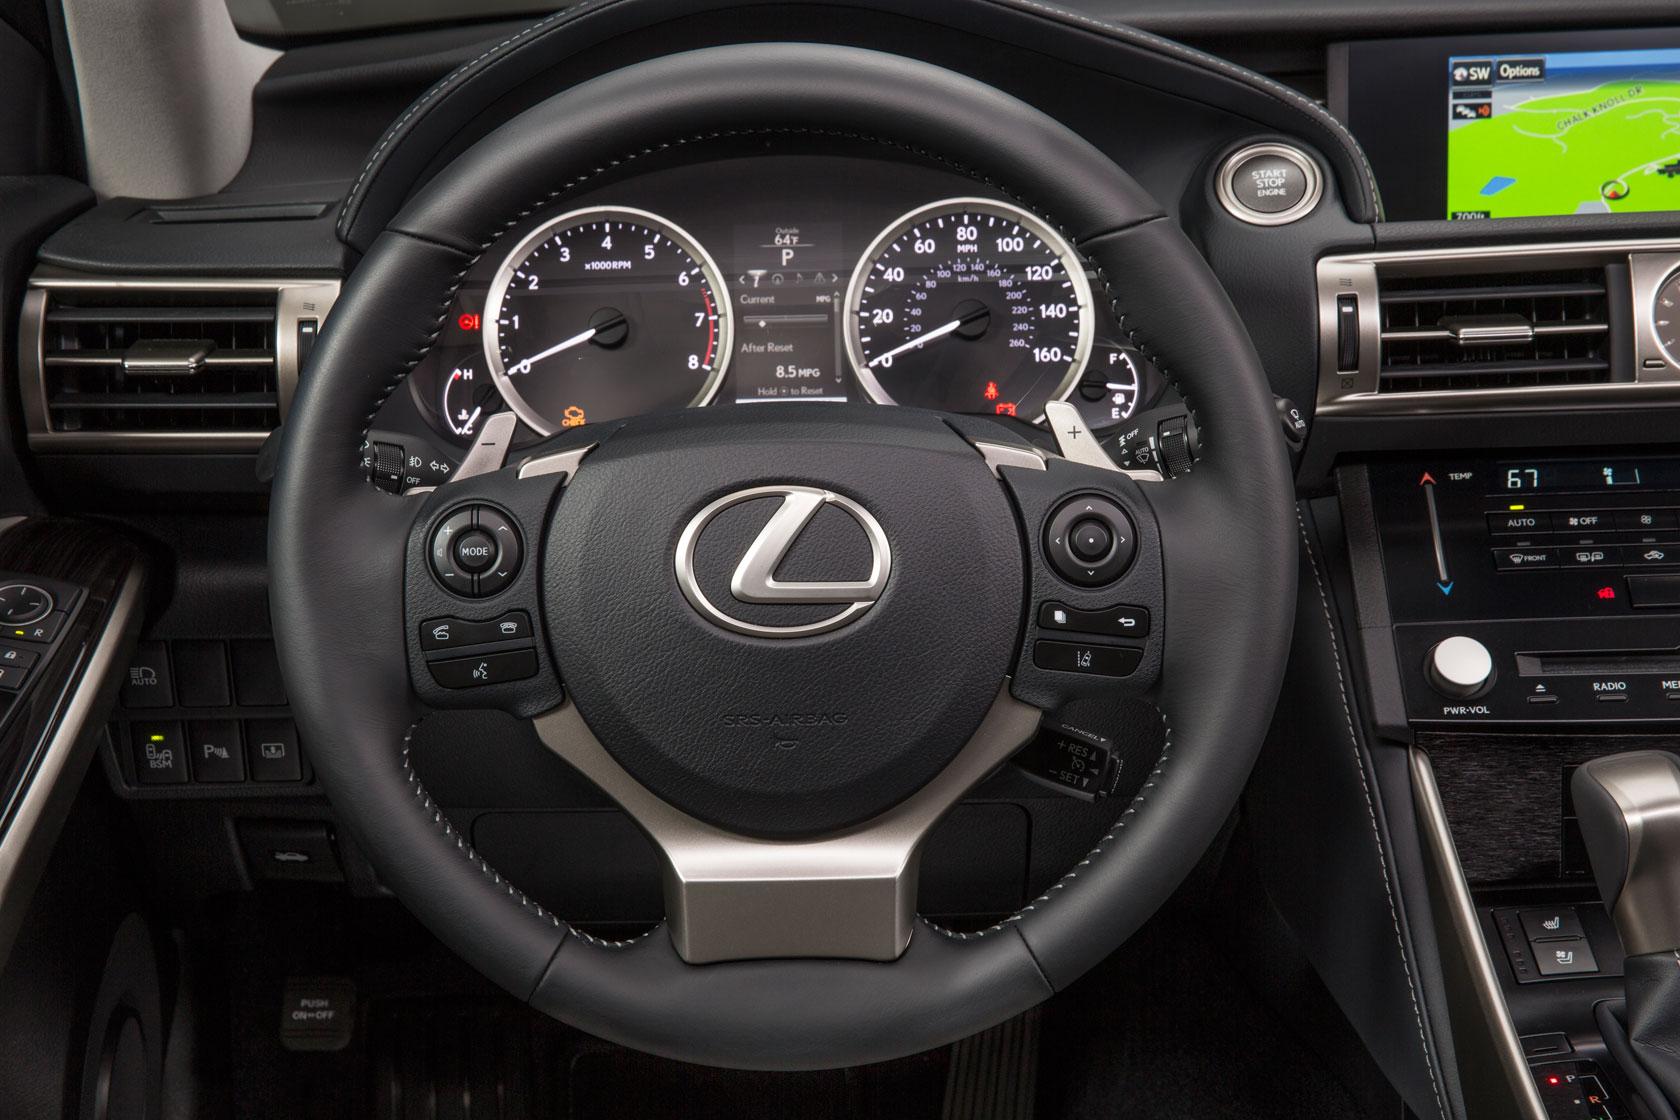 lexus is steering wheel. Black Bedroom Furniture Sets. Home Design Ideas